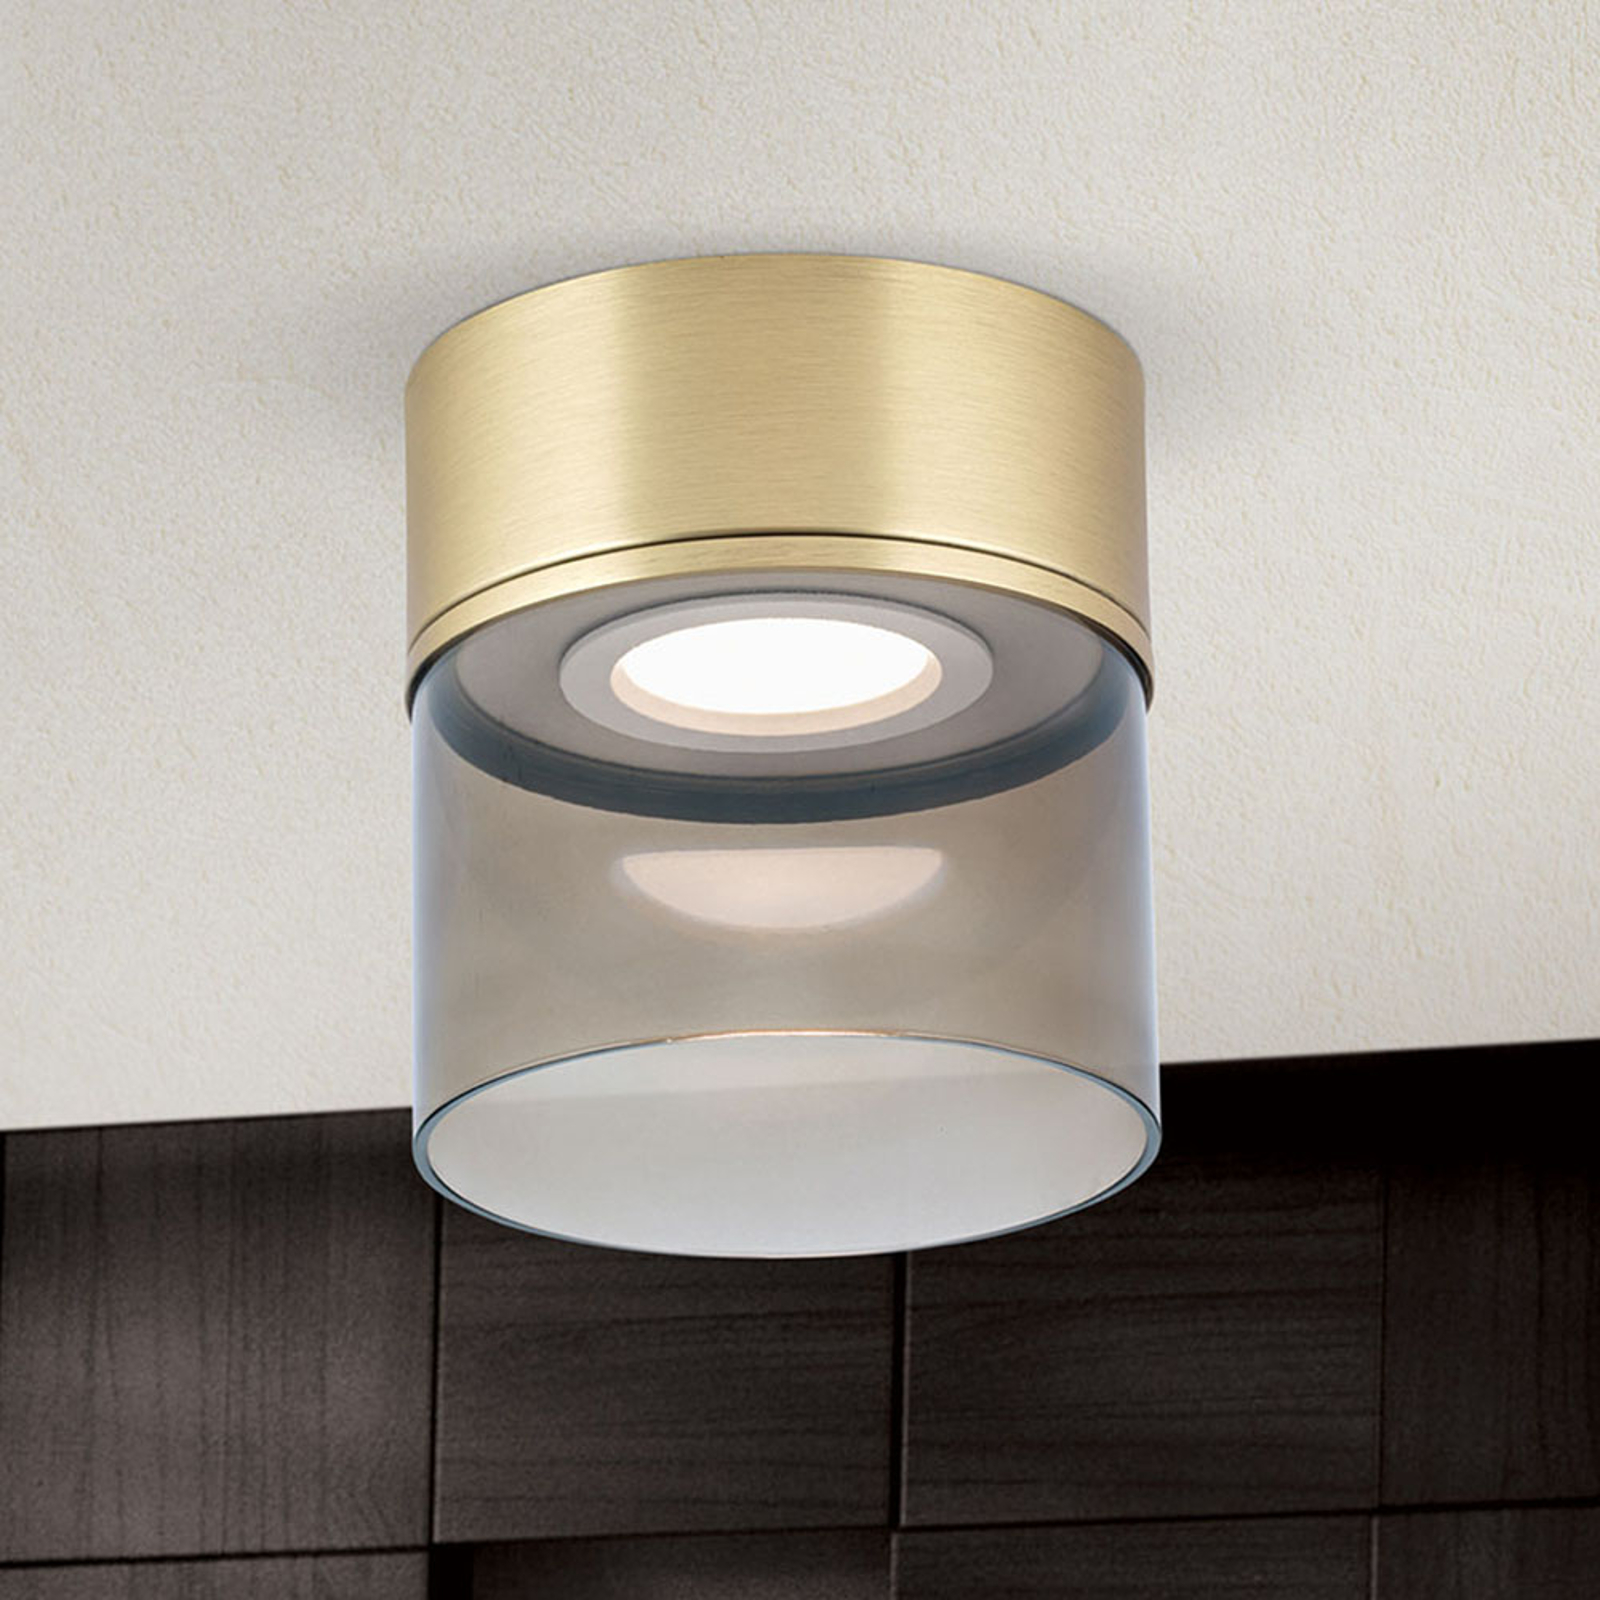 LED-taklampe Francis messing matt Ø 15 cm